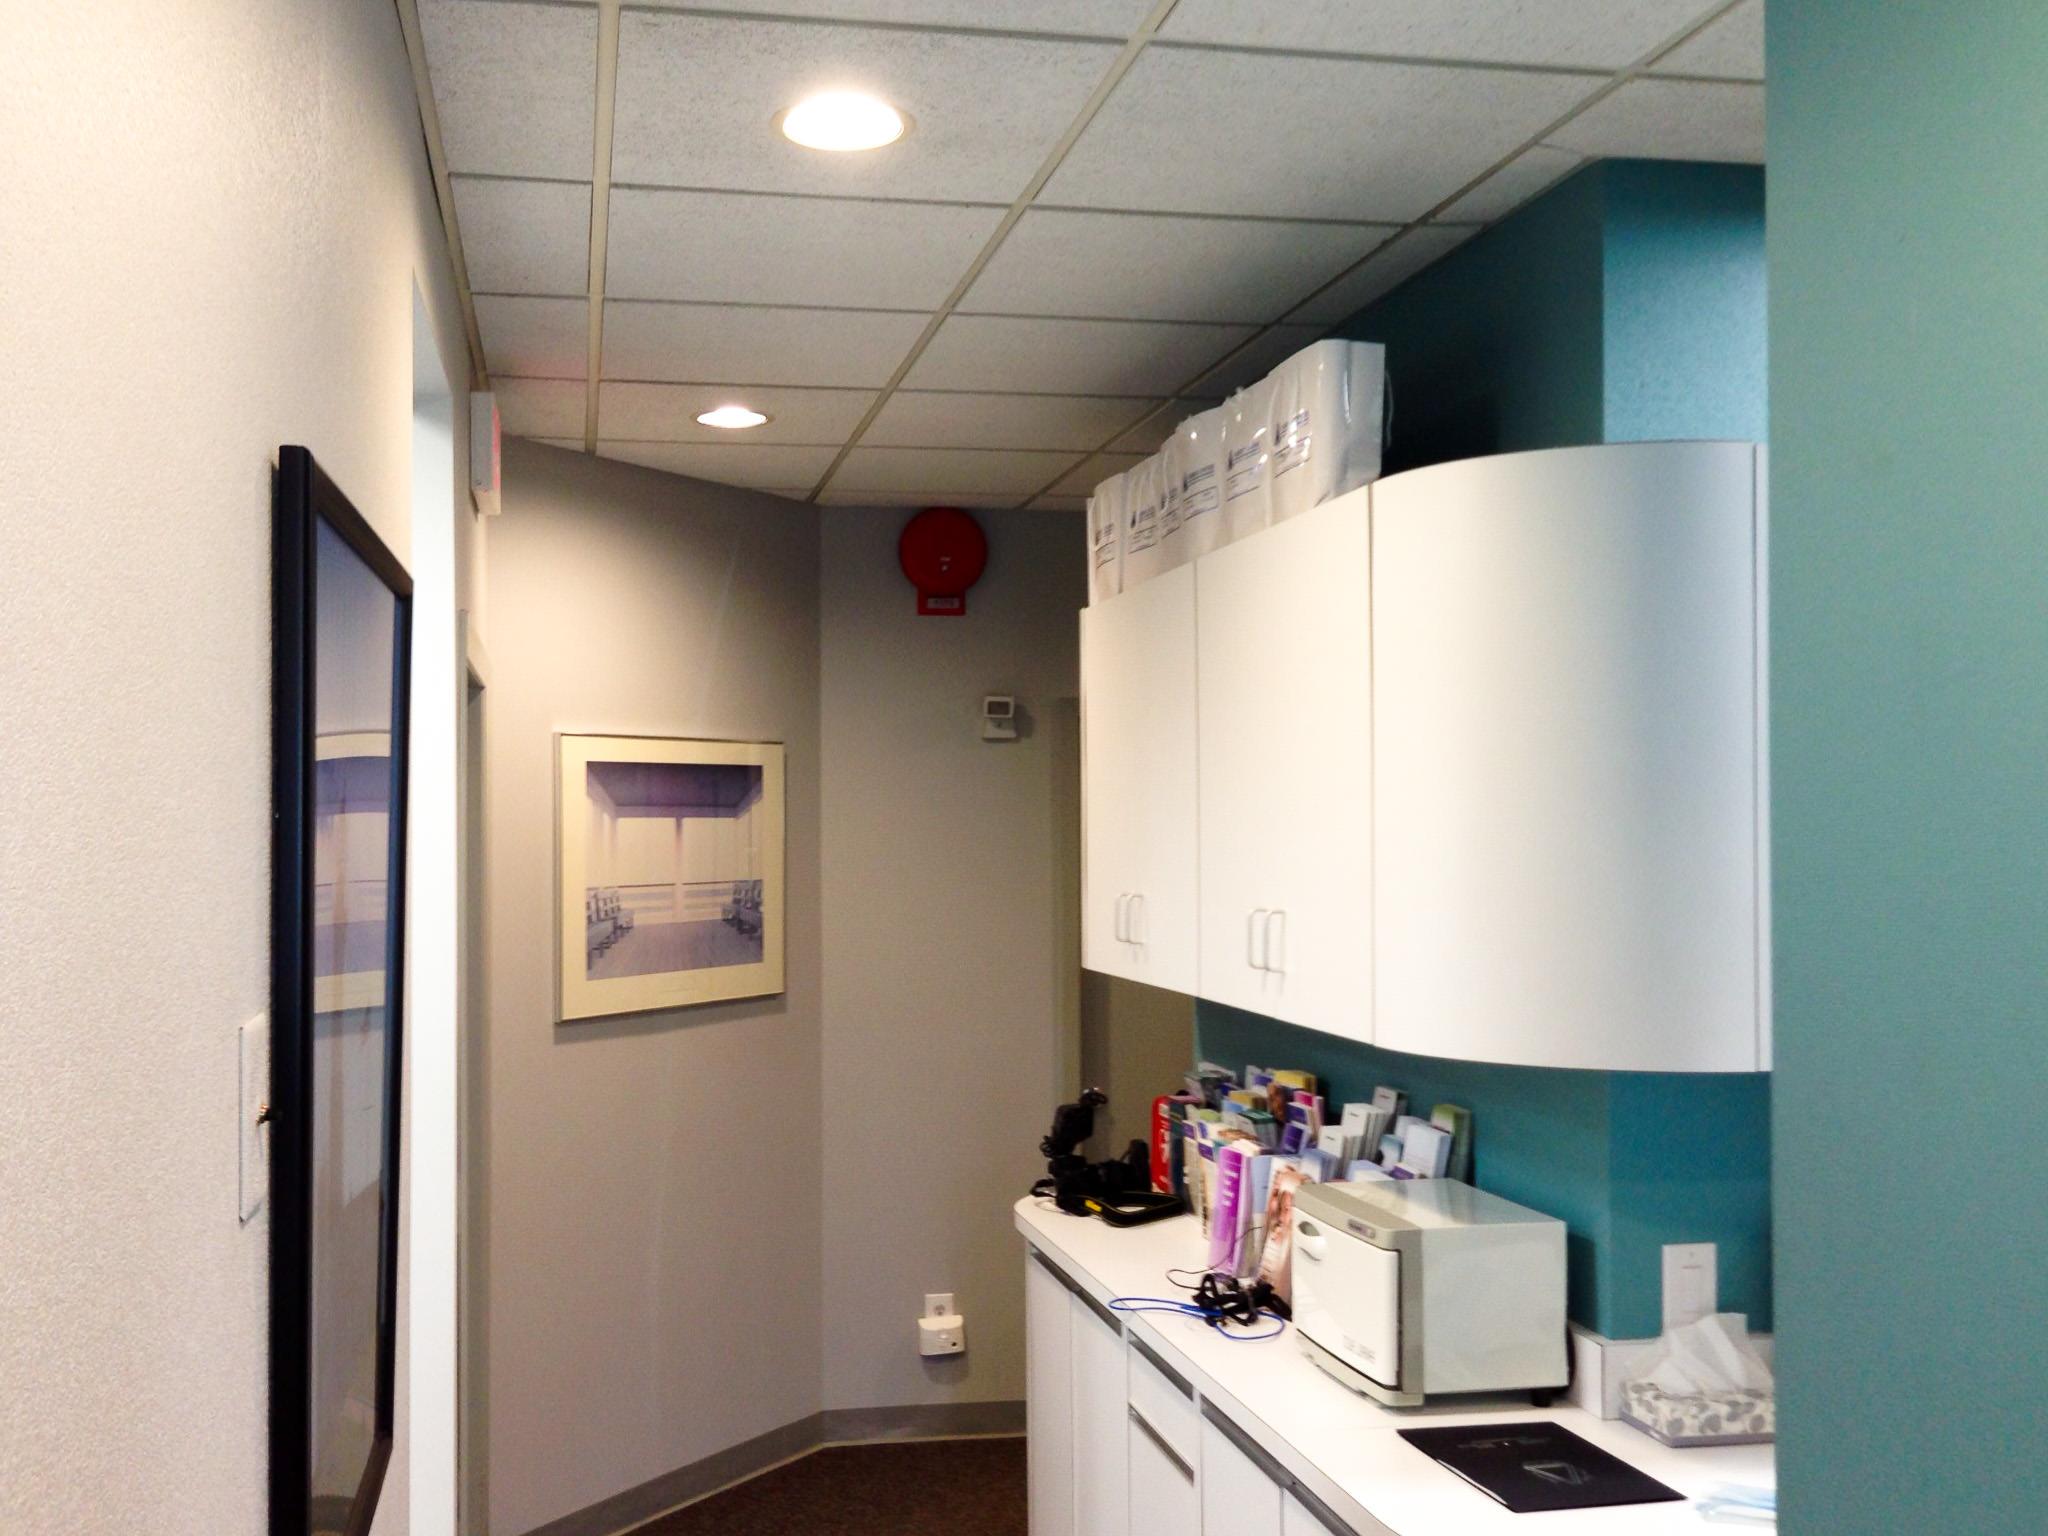 Compower Dentist Office LED Light Celing Indoor-110.jpg